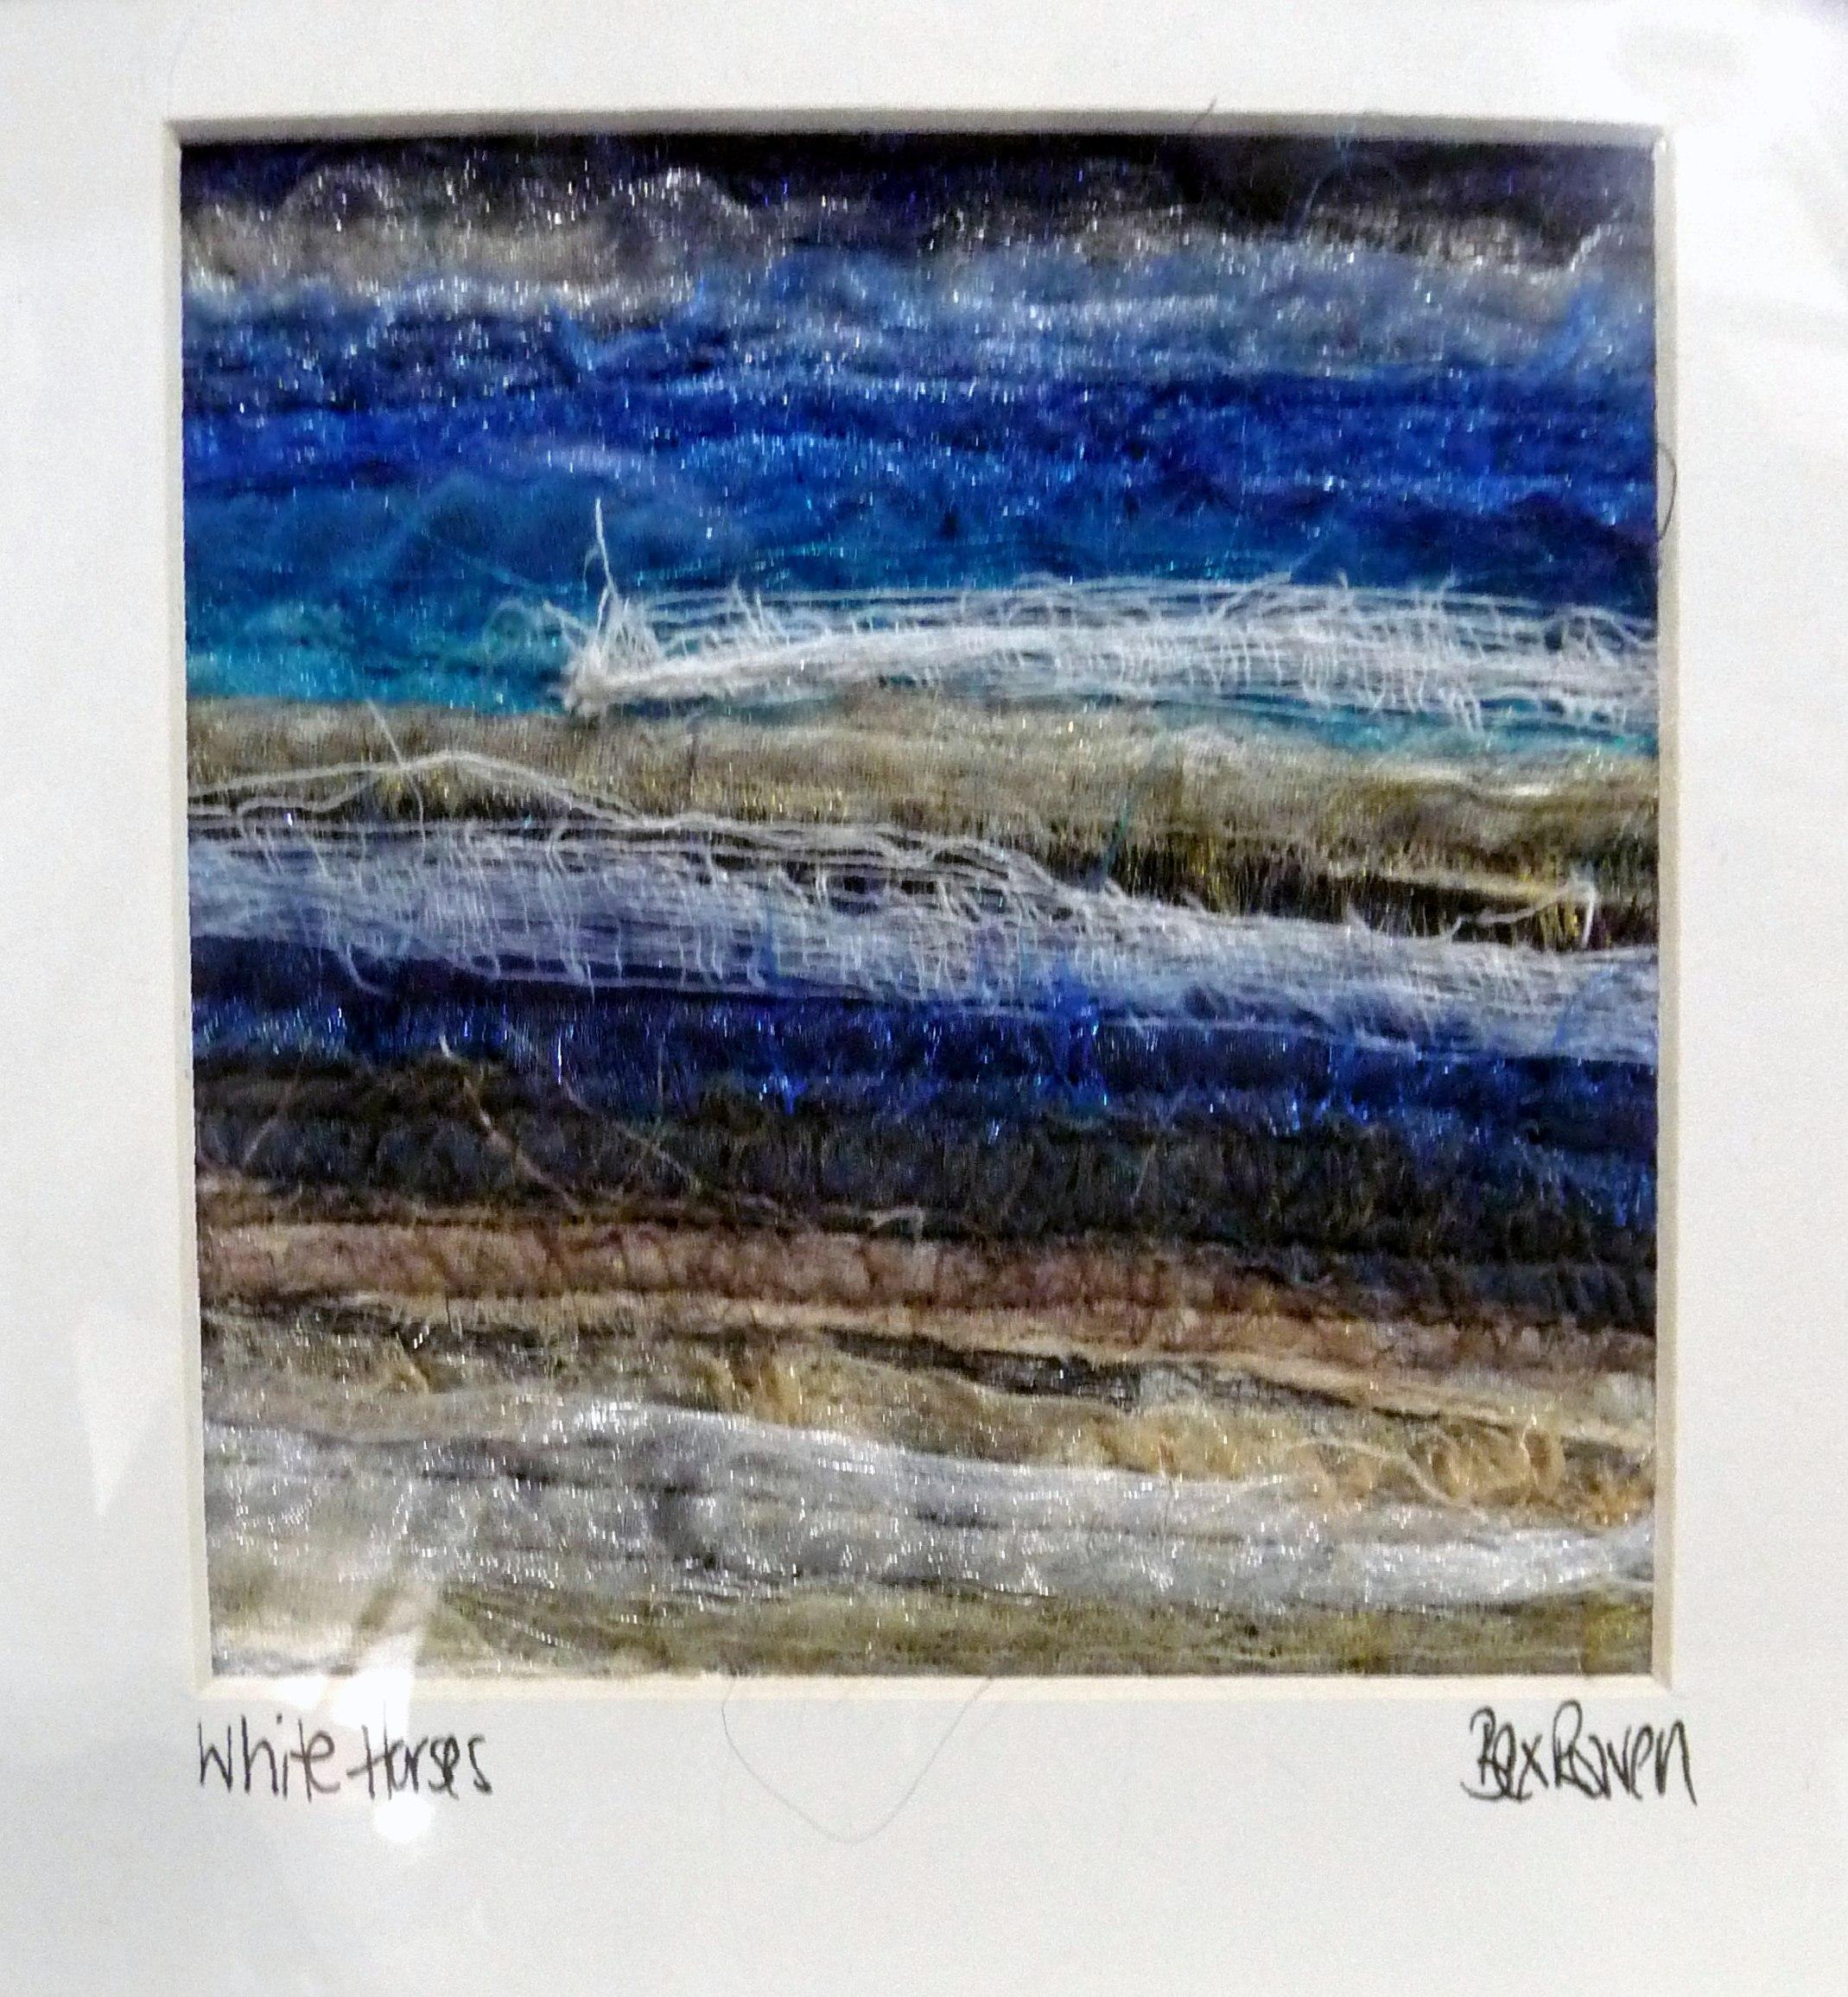 SEASCAPE 1 by Bex Raven, needle felting